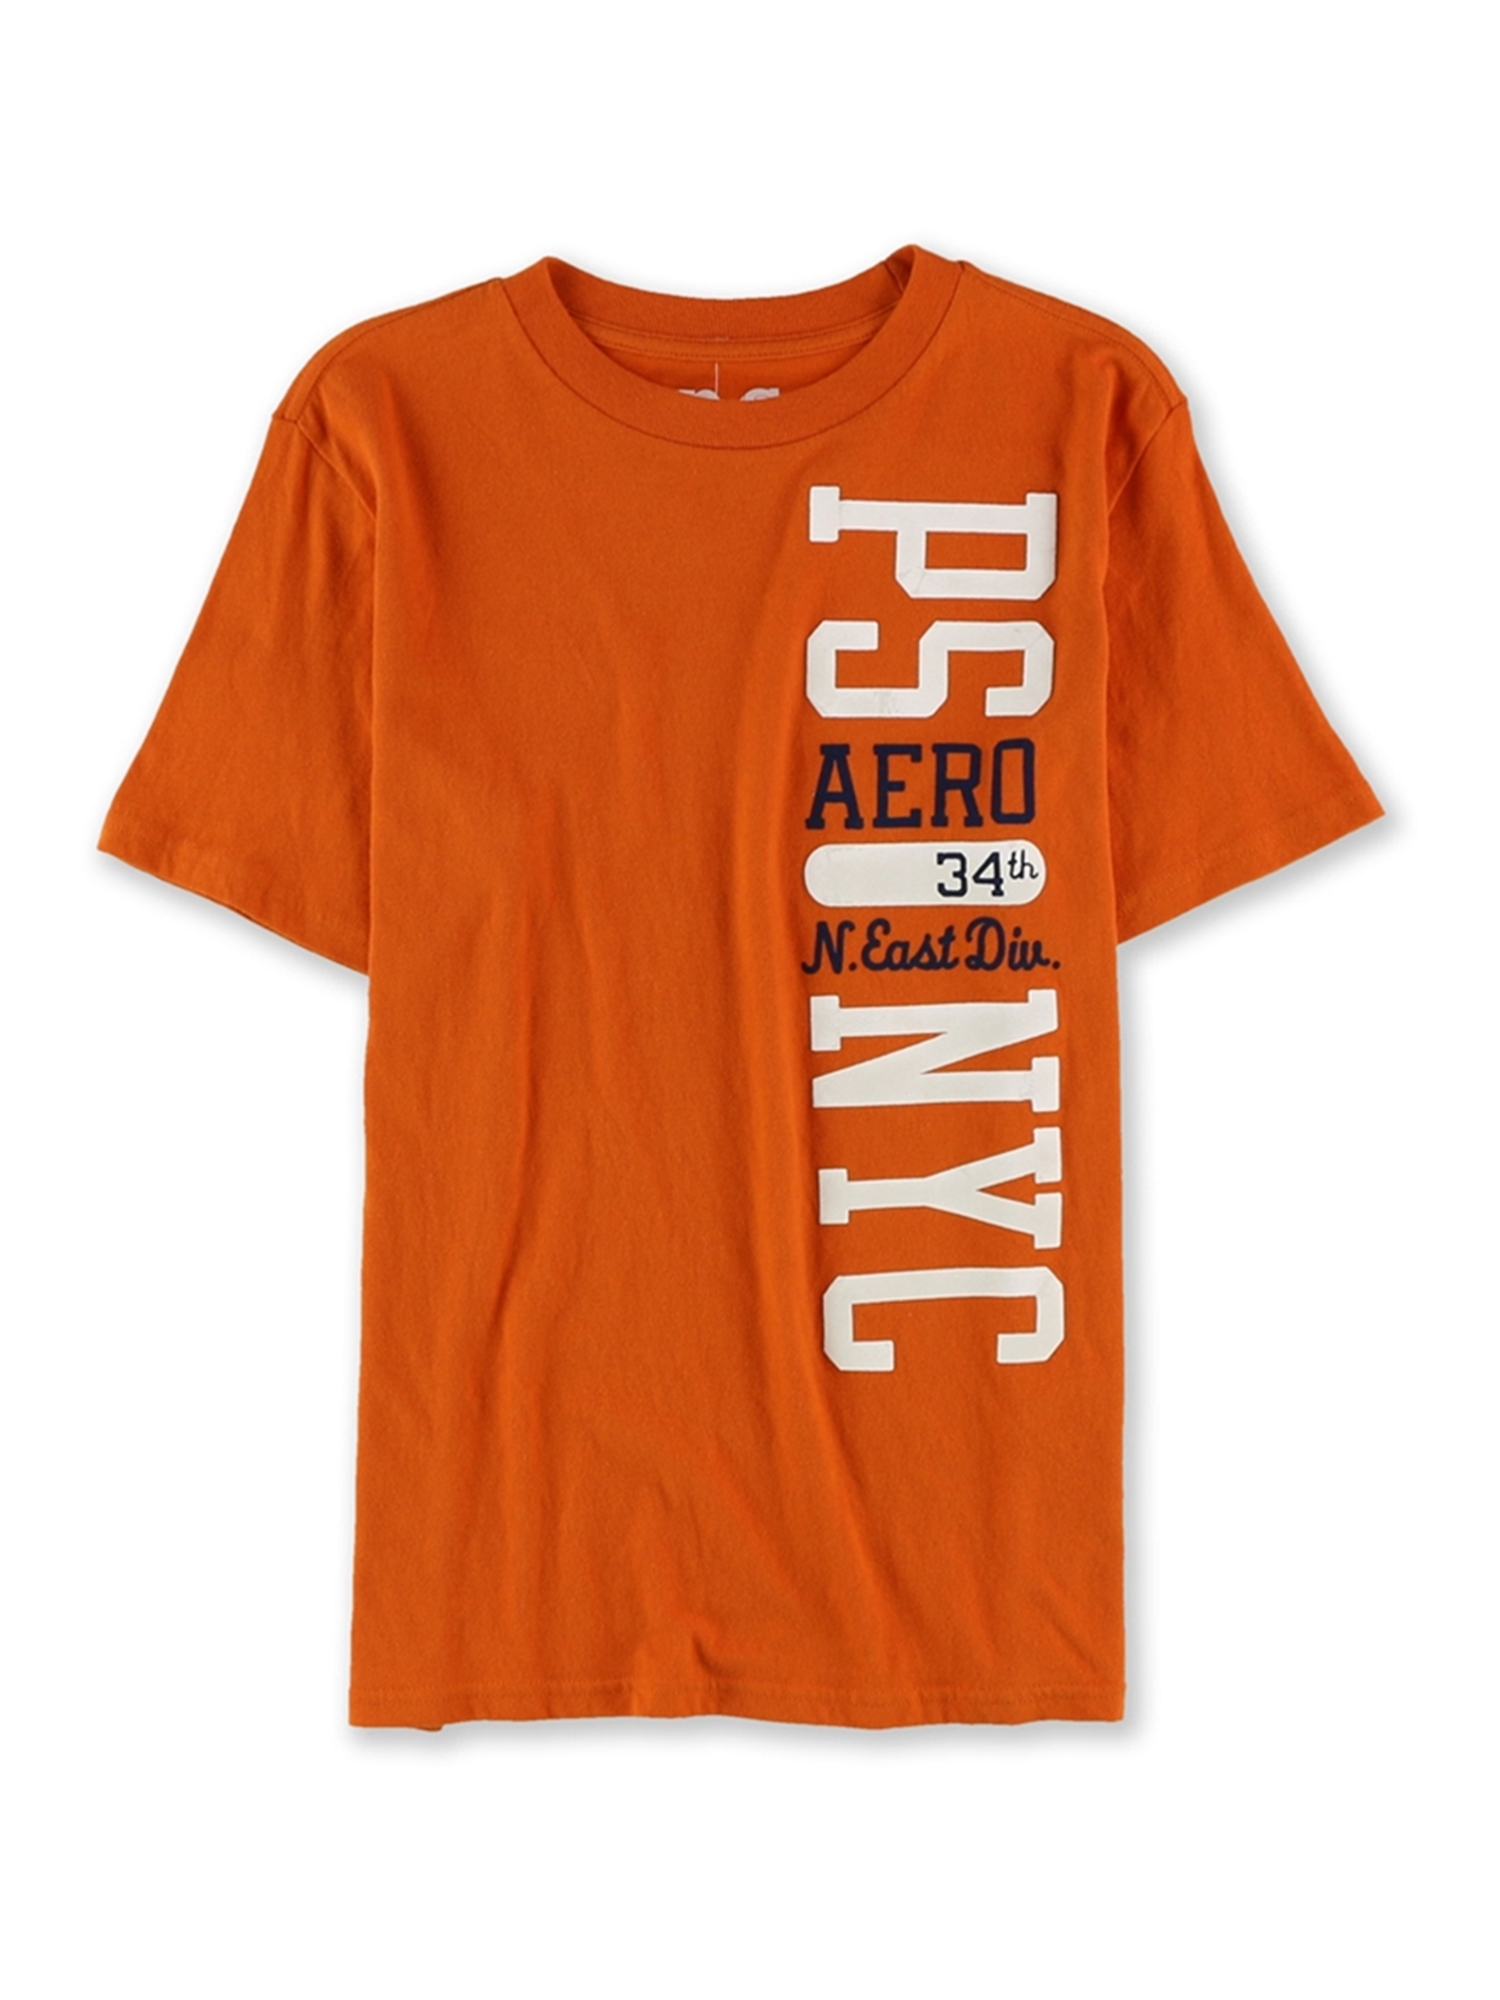 Aeropostale Boys Nyc Puff Paint Graphic T-Shirt